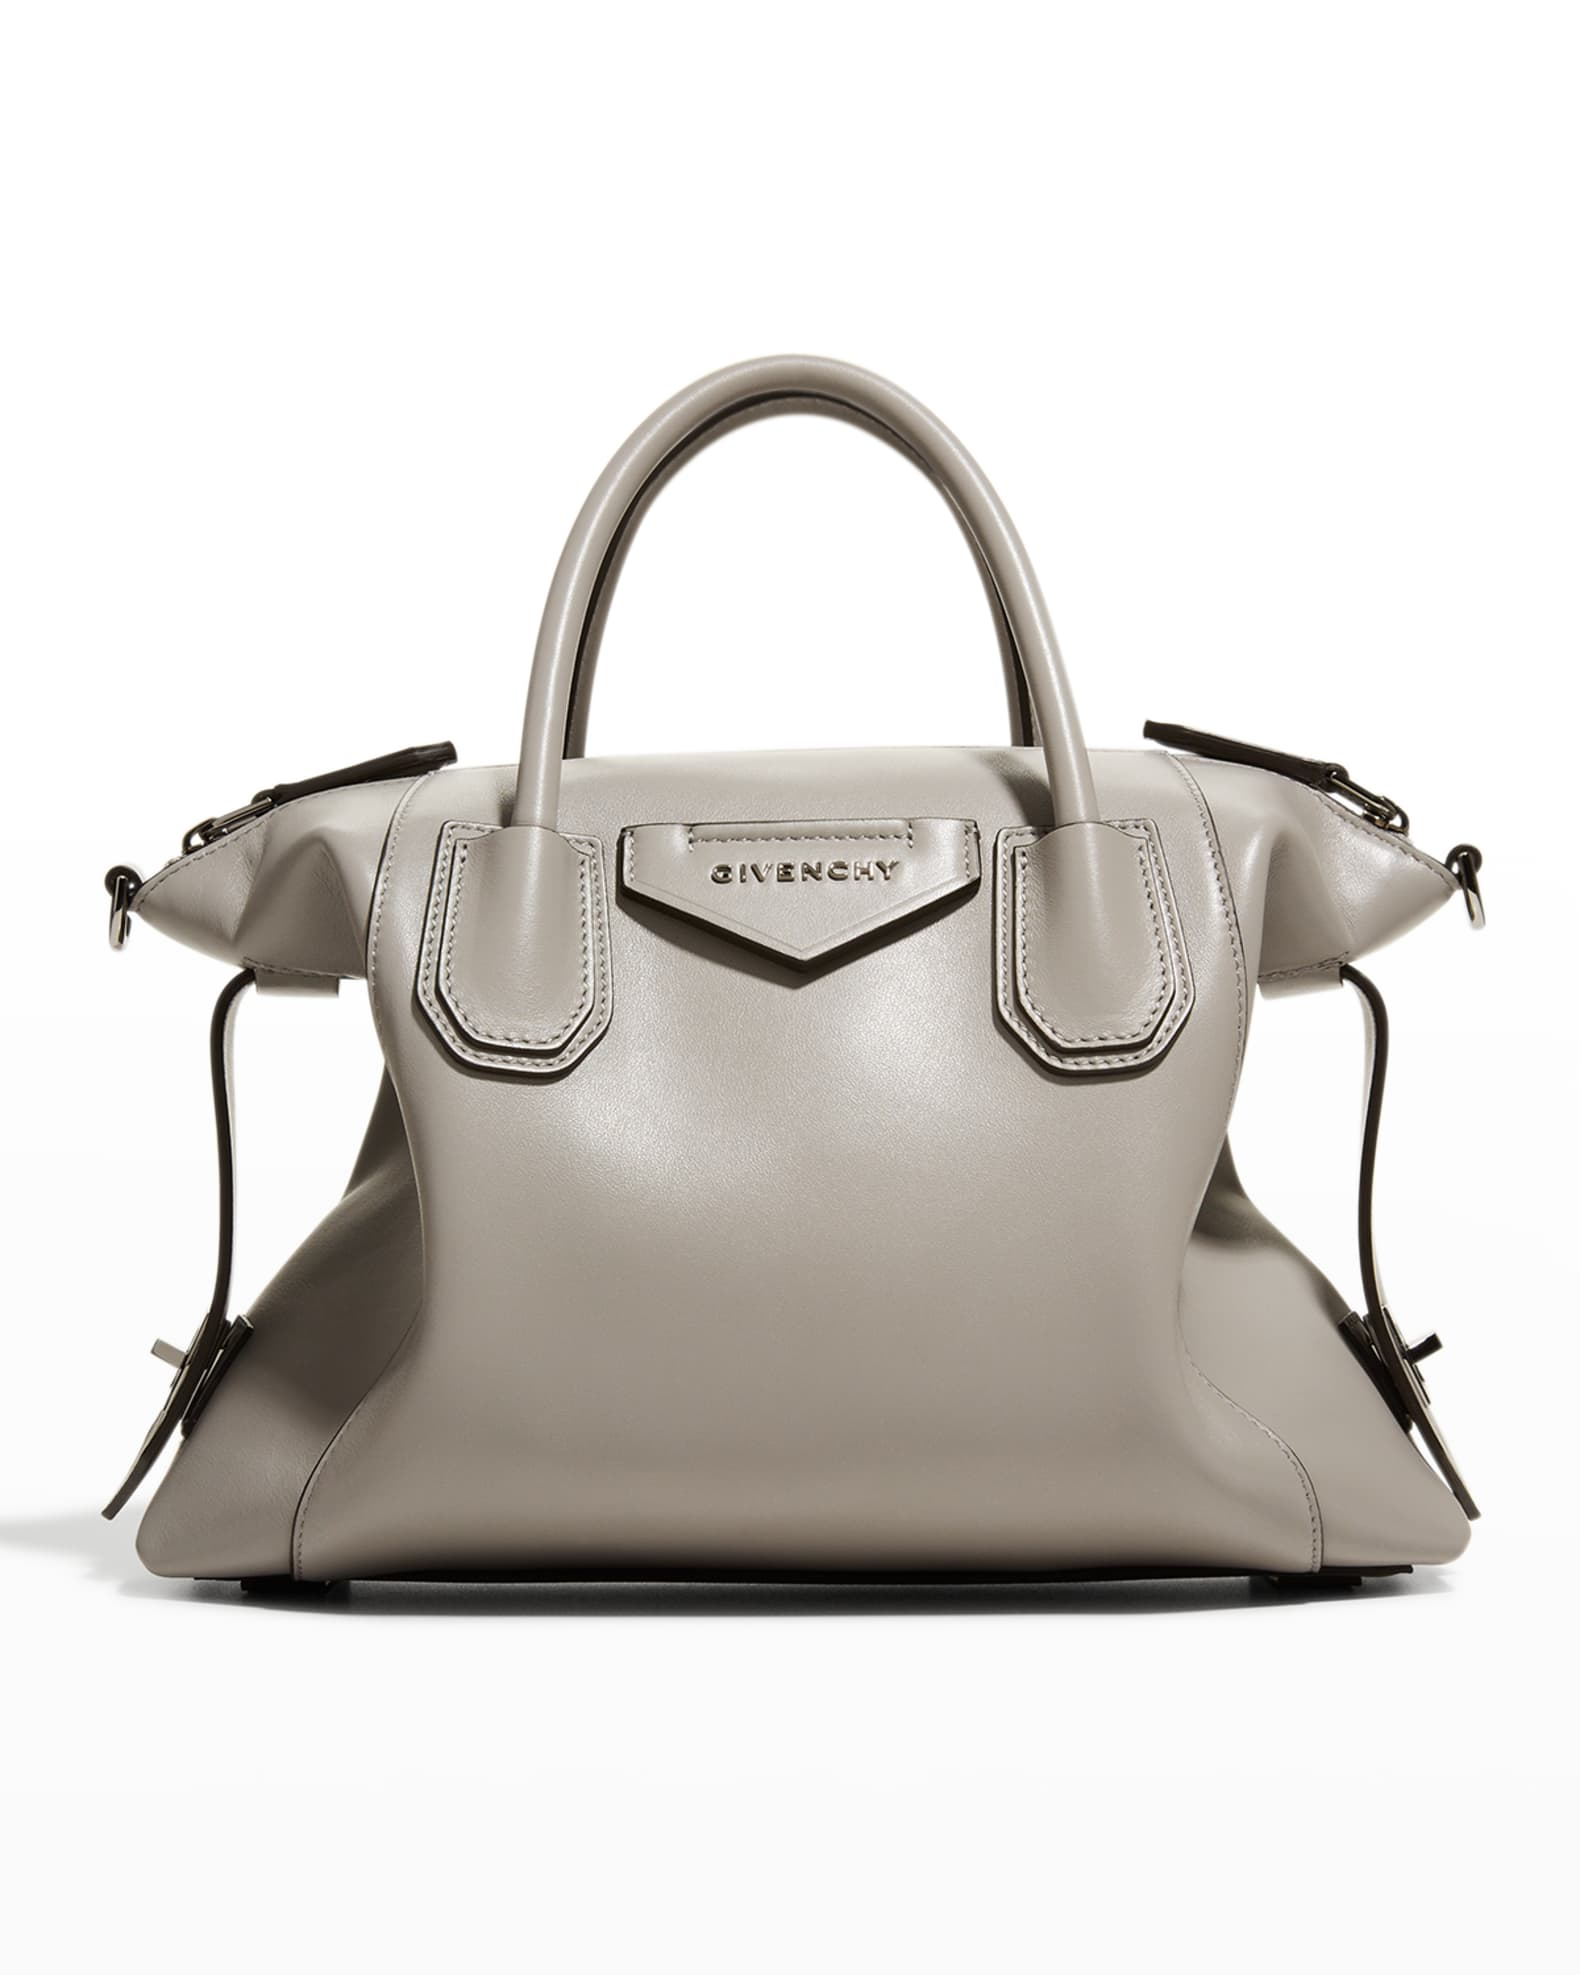 Givenchy Antigona Soft Small Leather Bag